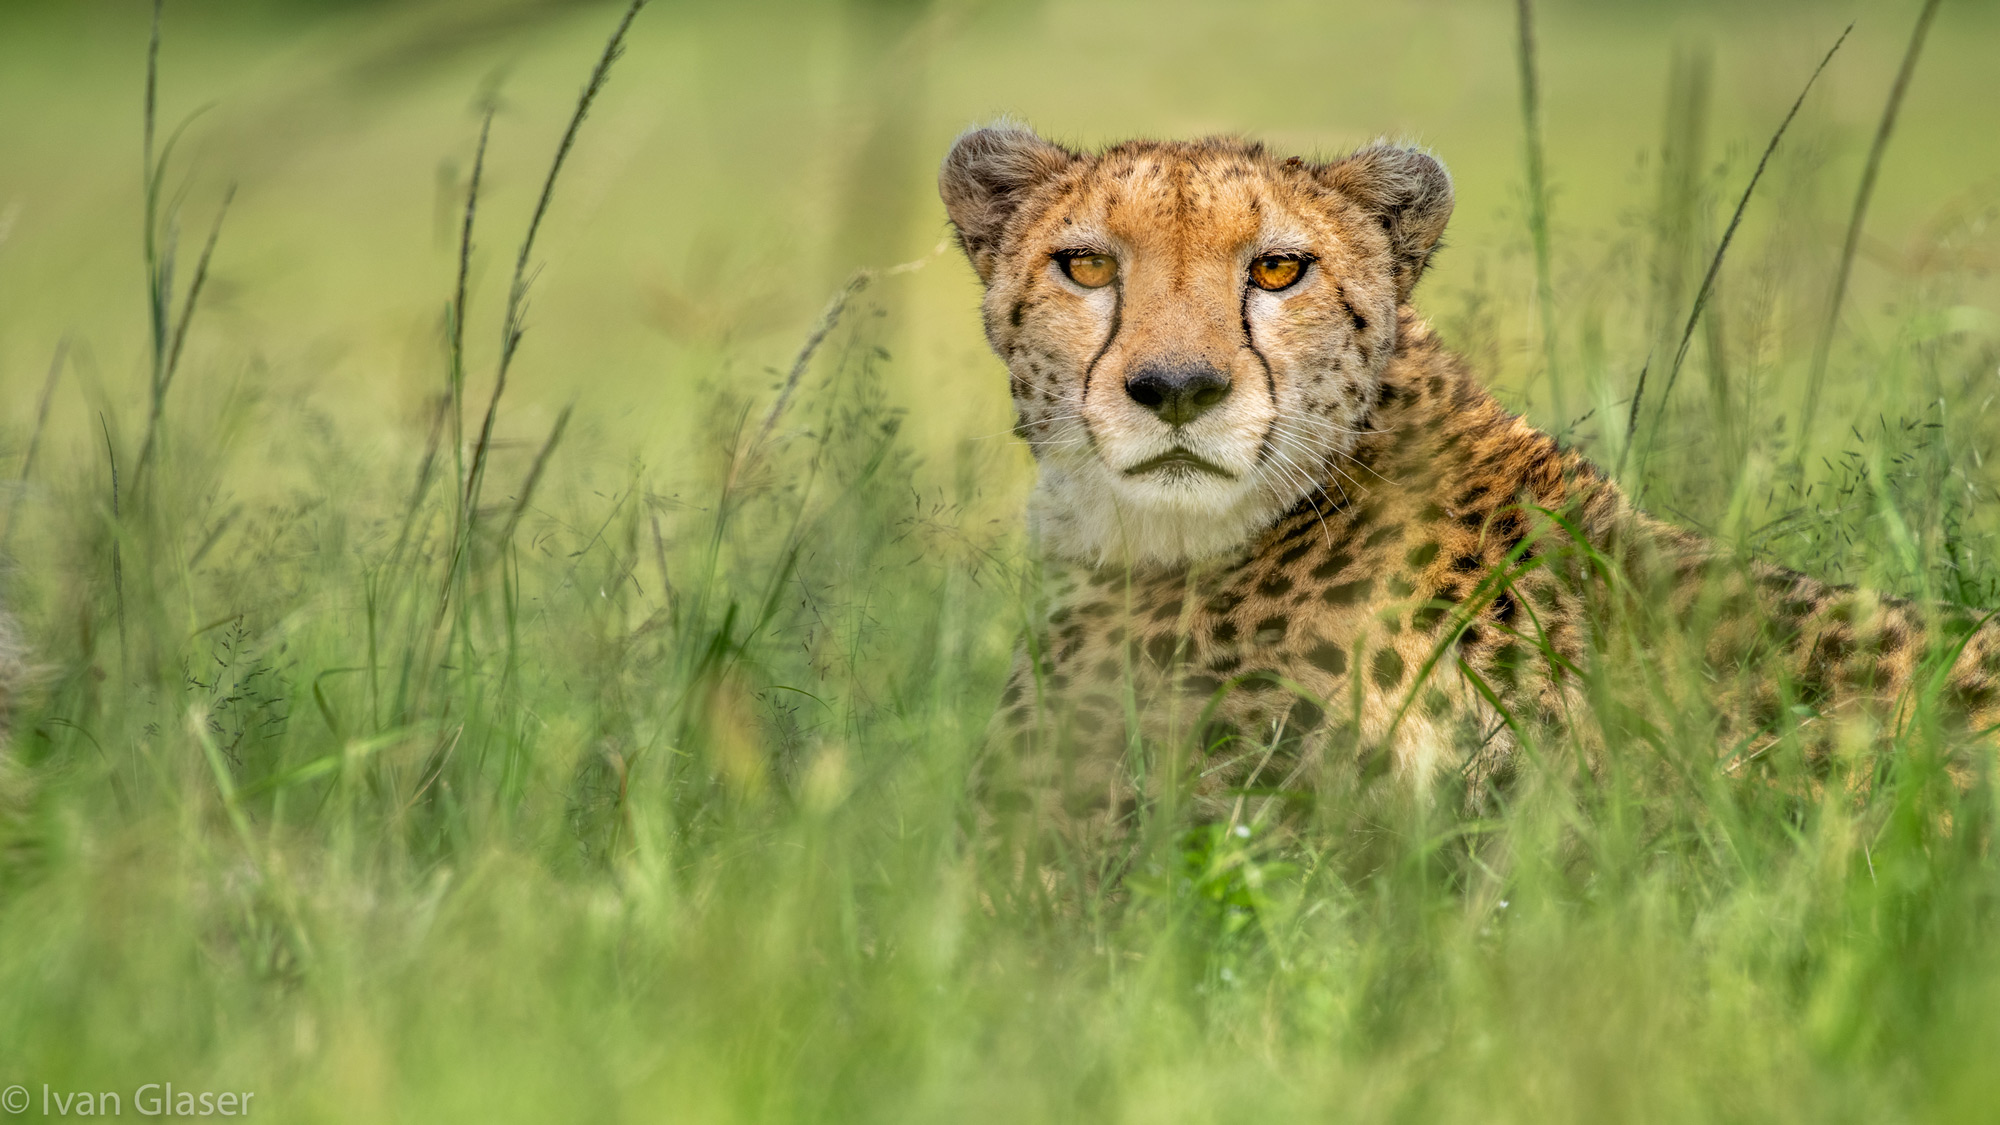 Cheetah resting in the grass in Maasai Mara